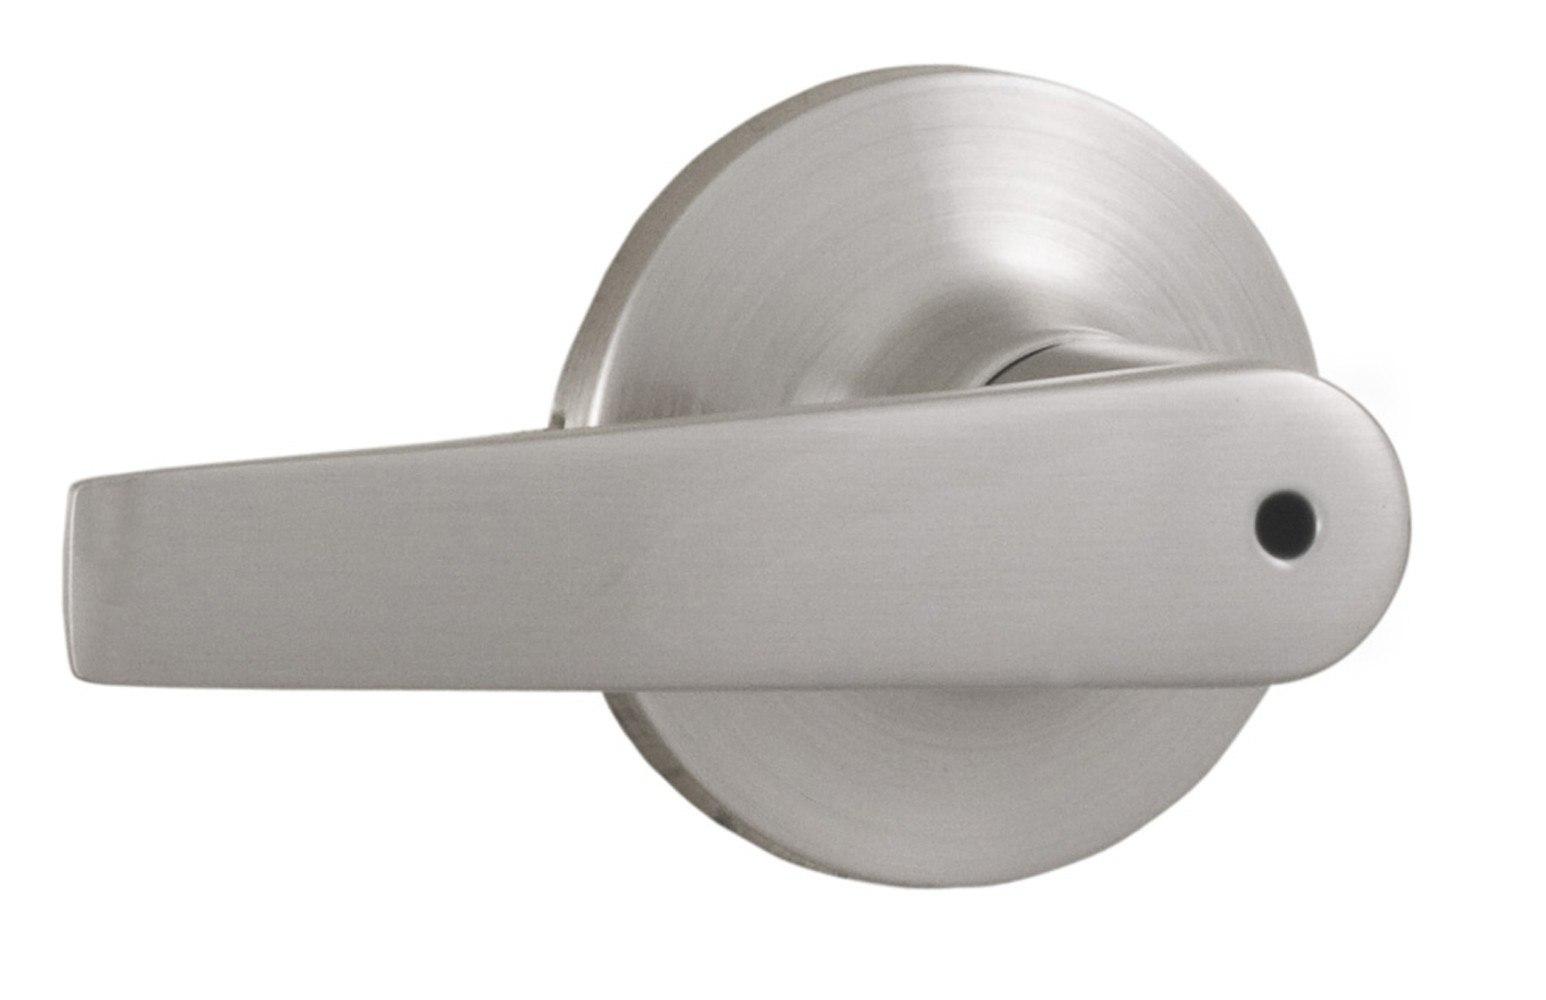 Weslock 00210WNWNFR20 Bristol Lever Satin Nickel